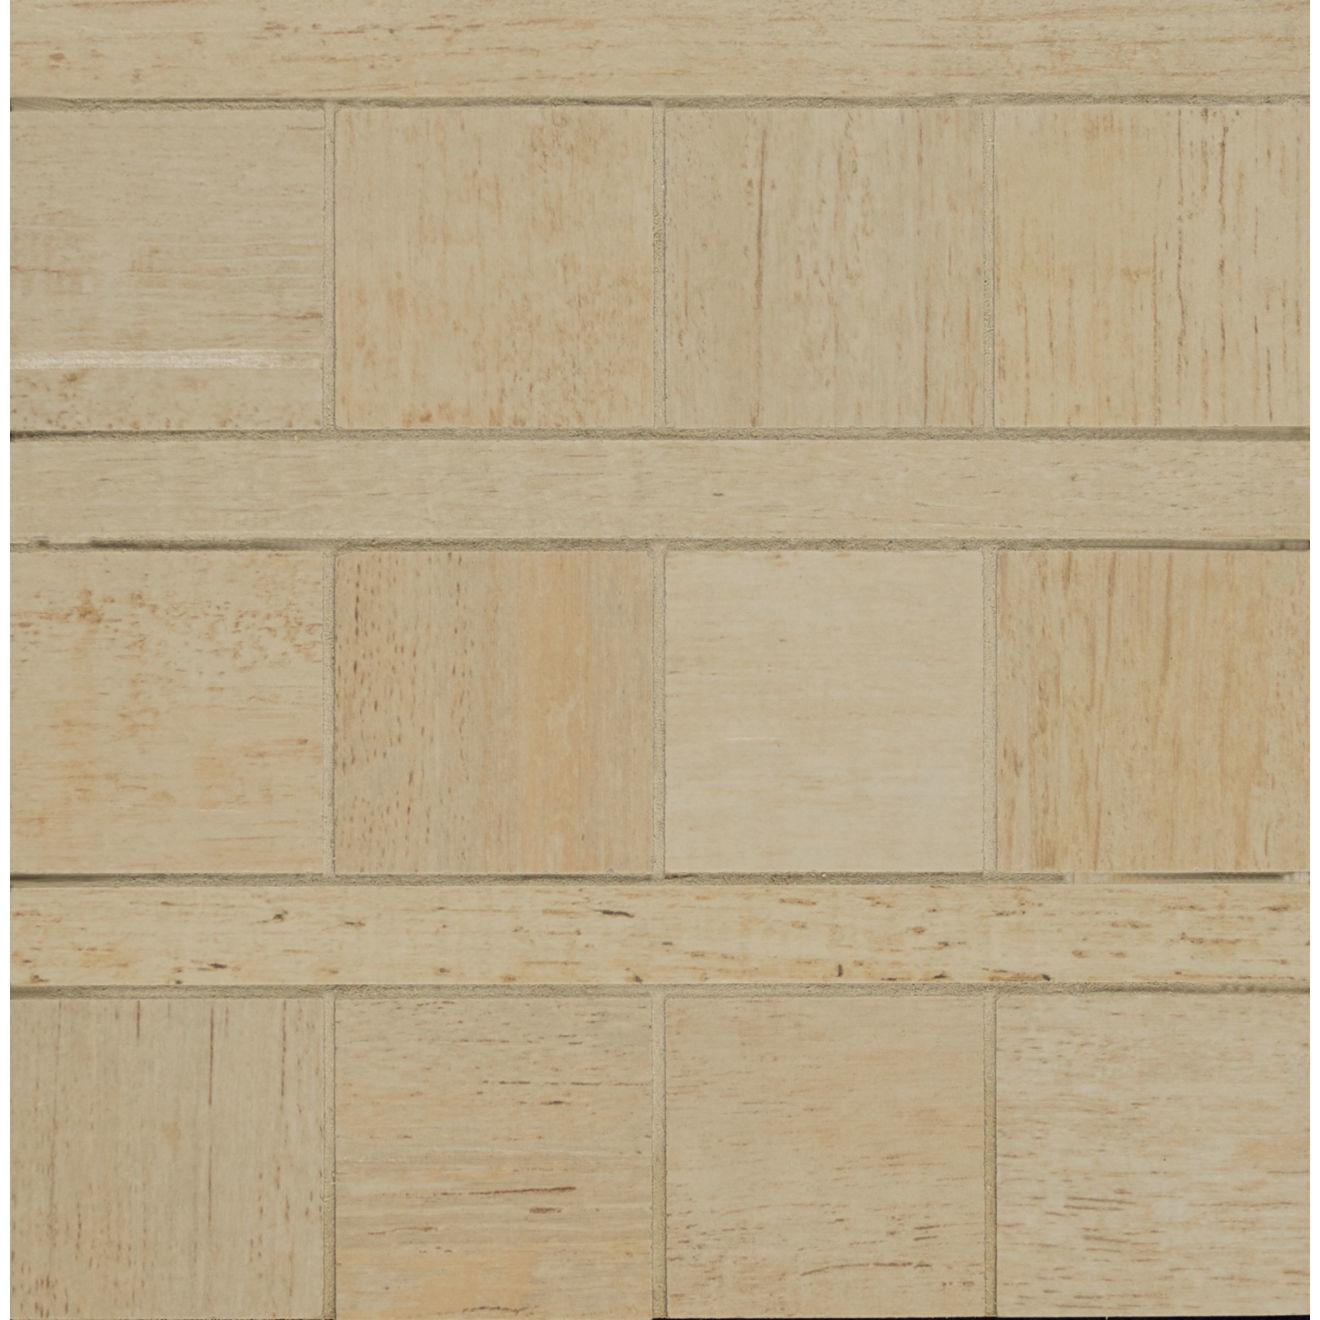 "Barrique 8"" x 8"" Wood Look Matte Porcelain Mosaic Tile in Ecru"